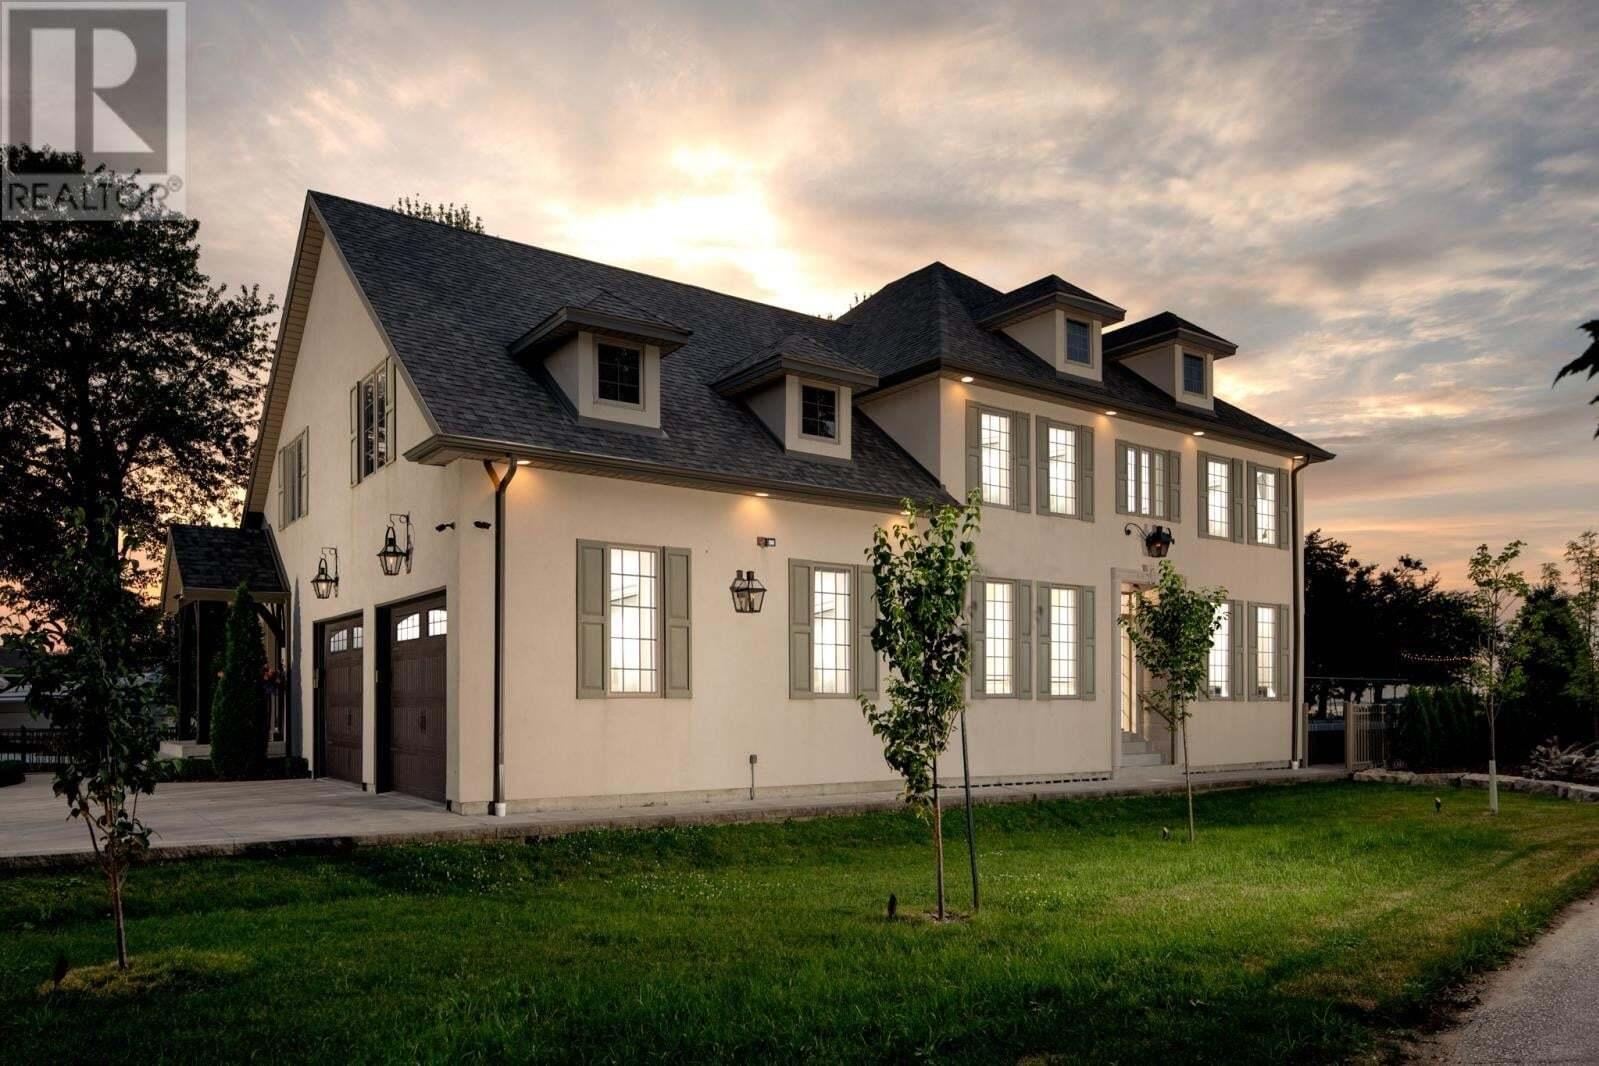 House for sale at 13058 Riverside Dr Tecumseh Ontario - MLS: 20009369